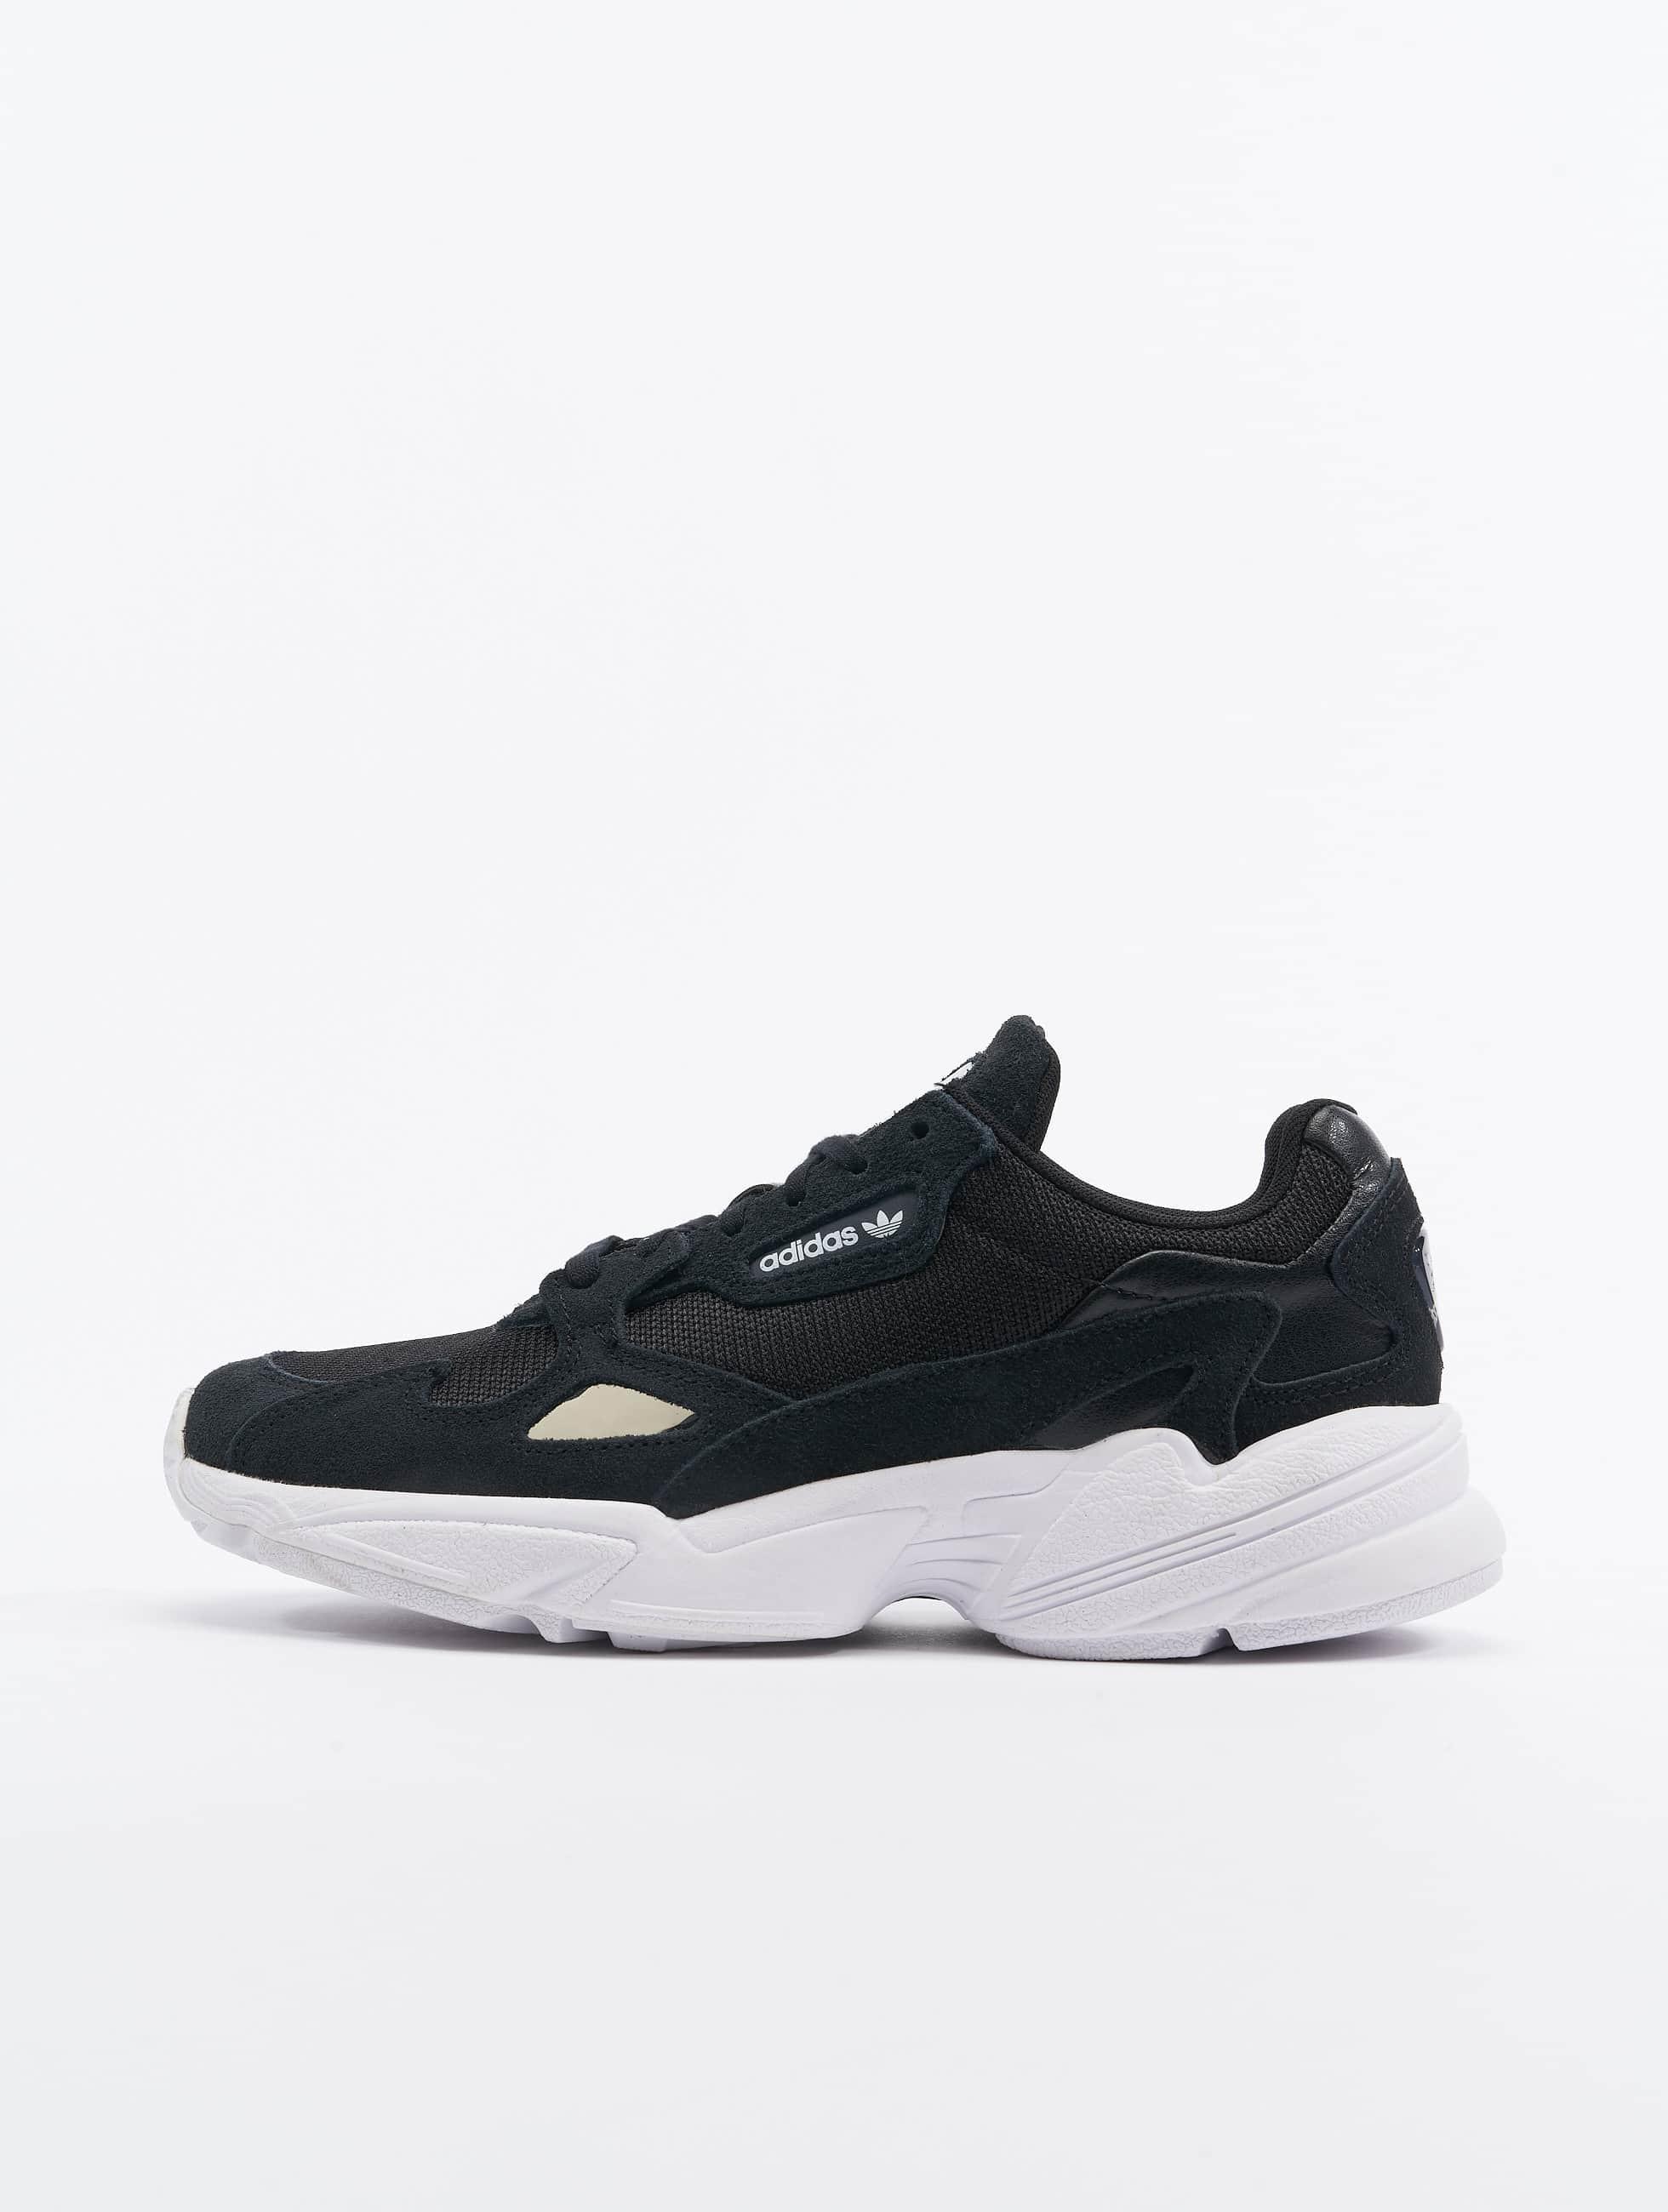 0056f8bf00a adidas originals schoen / sneaker Falcon in zwart 497932